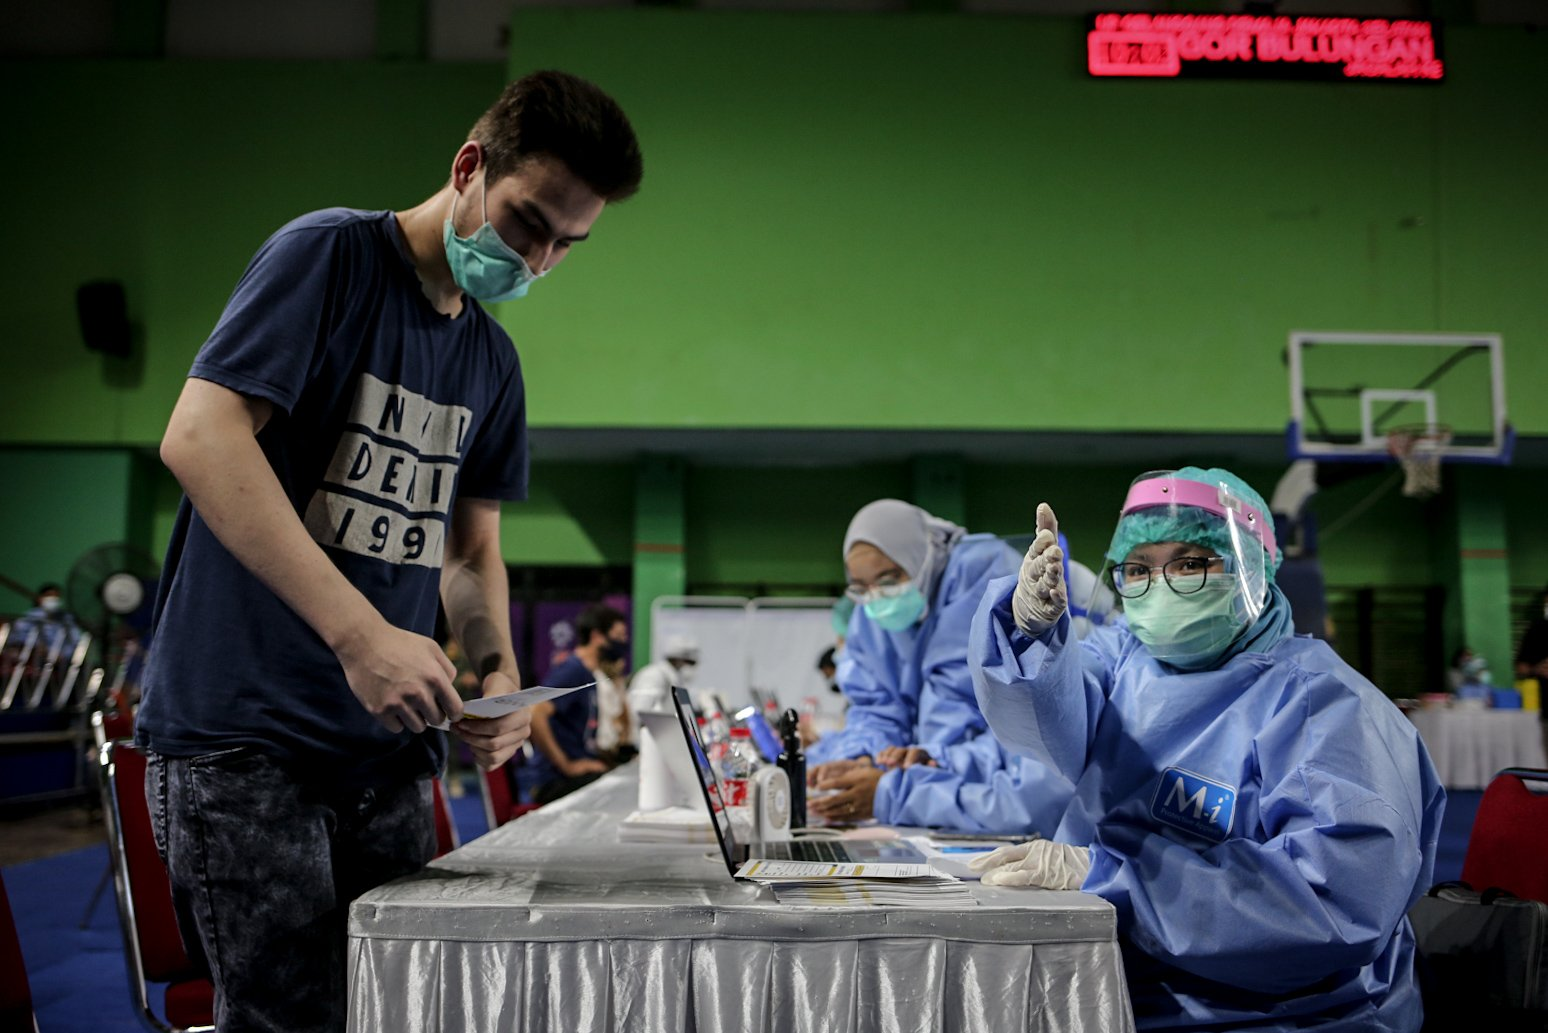 Petugas medis mengarahkan pencari suaka saat vaksinasi COVID-19 di GOR Bulungan, Jakarta Selatan, Kamis (7/10/2021). Vaksinasi tersebut digelar atas kerja sama Pemprov DKI Jakarta, UNHCR dan Kadin Indonesia. Sebanyak 600 vaksin dosis pertama disediakan dalam vaksinasi tersebut.